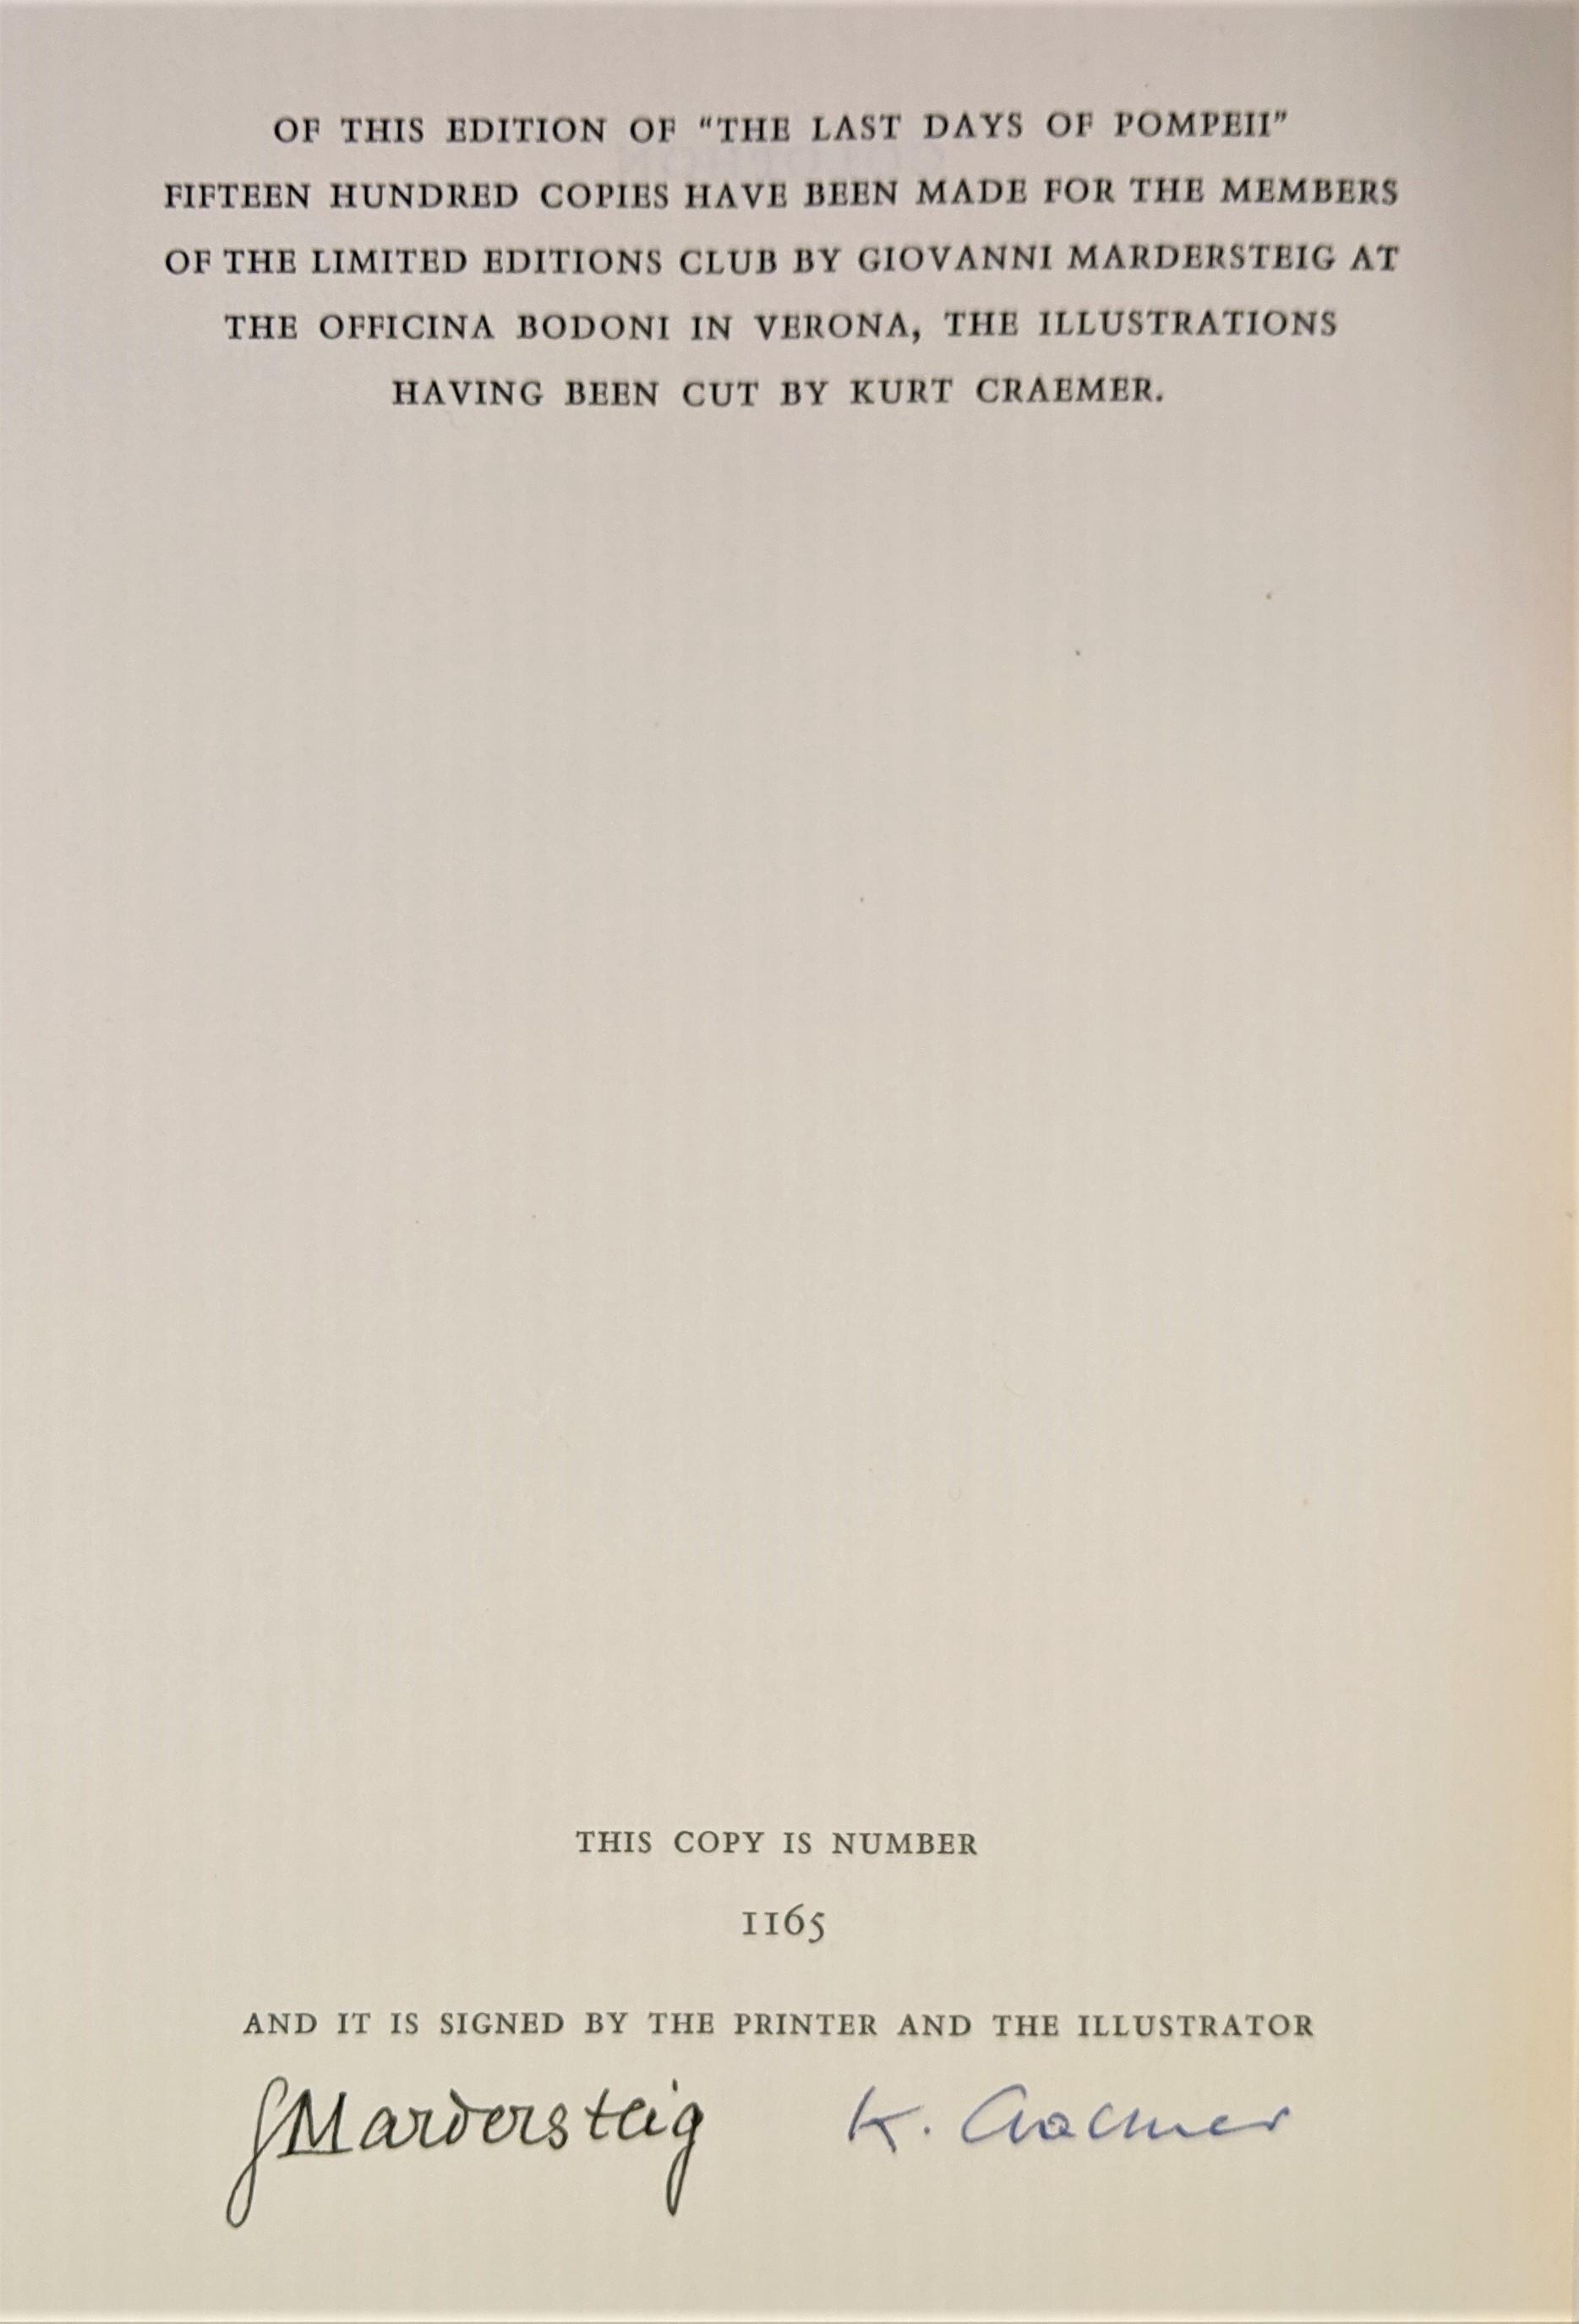 THE LAST DAYS OF POMPEII, by E.G.Bulwer-Lytton; Kurt Craemer  - 1956 [ills. Signed Lt Ed]